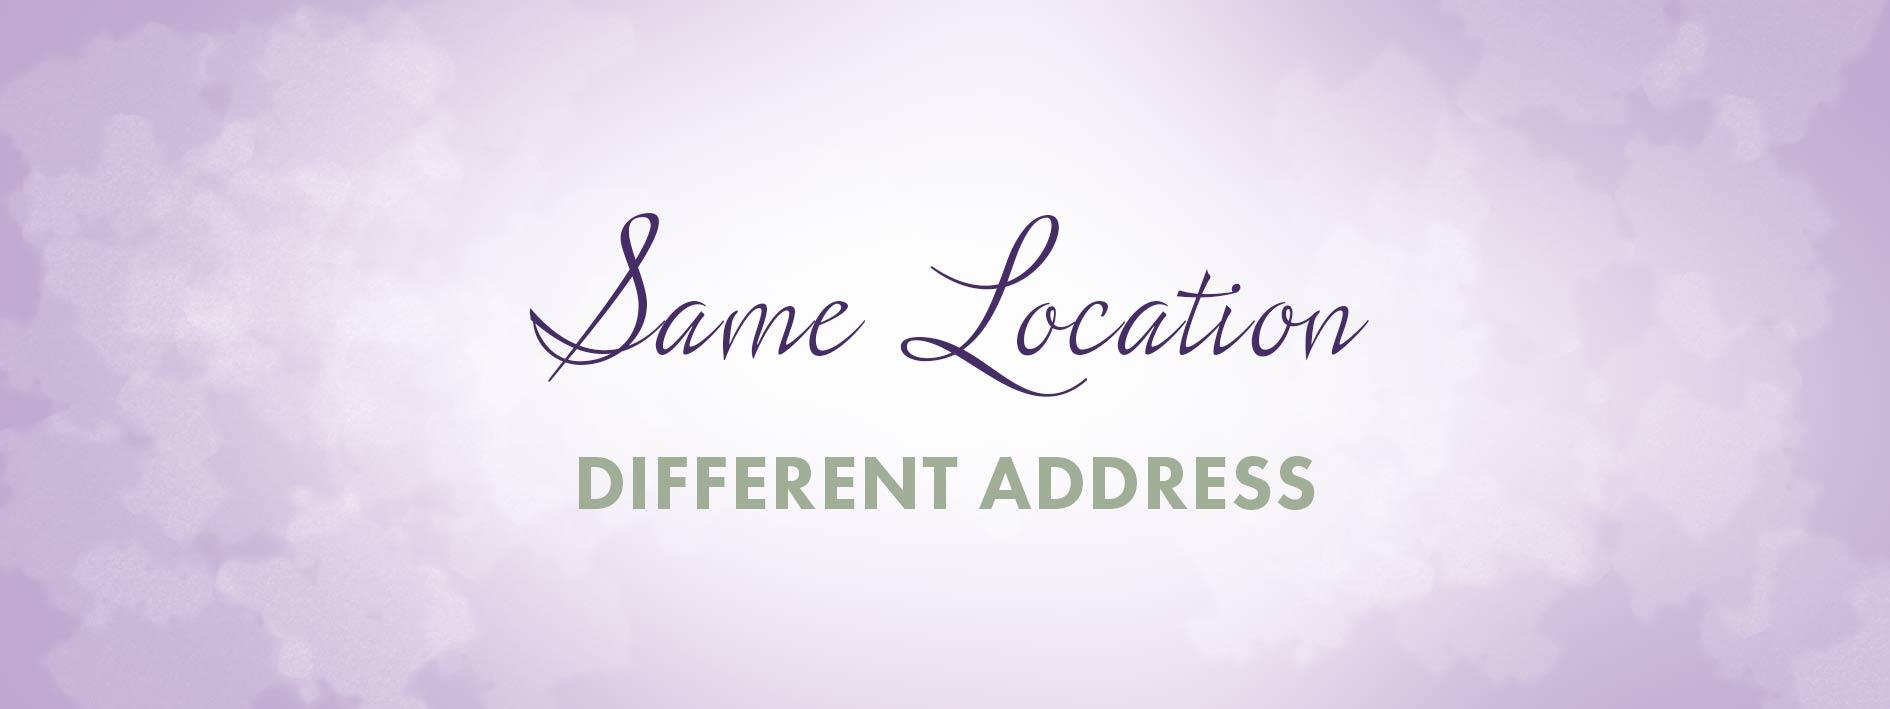 Same Location - Different Address